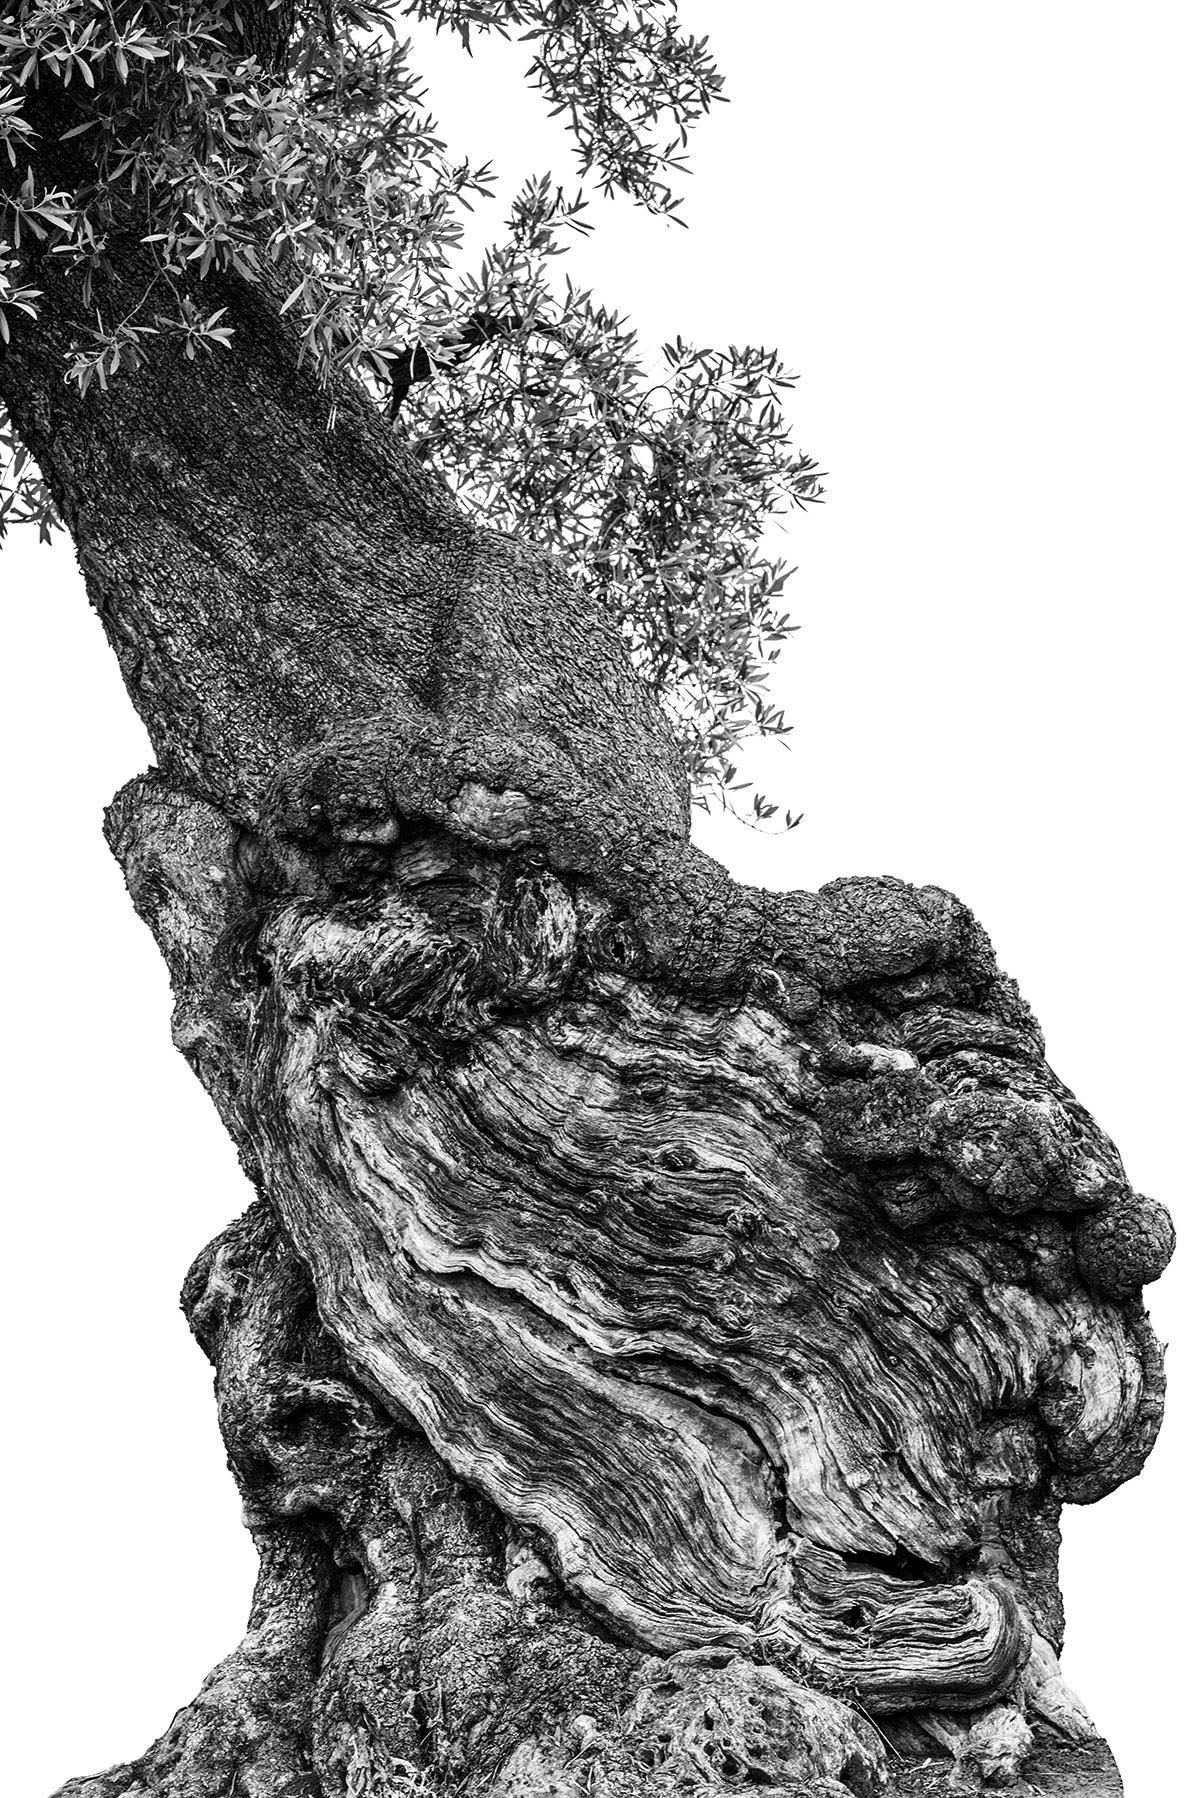 martin-ogolter-Monumentali-nature-landscape-photographer-06